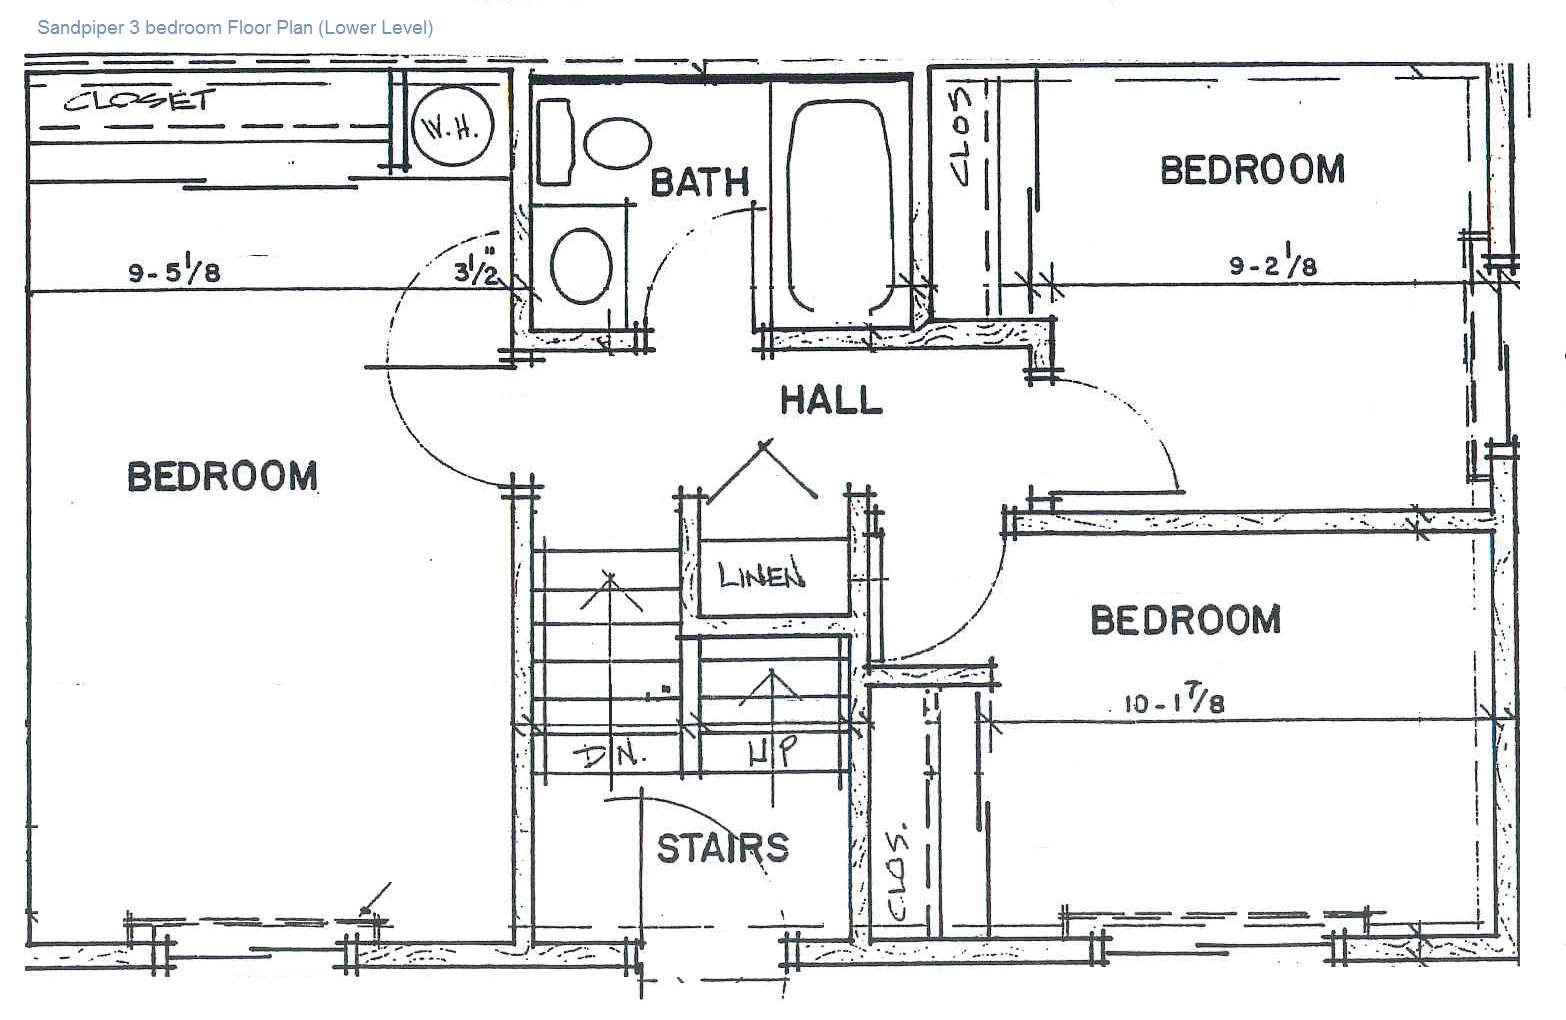 3 Bedroom: Lower Level